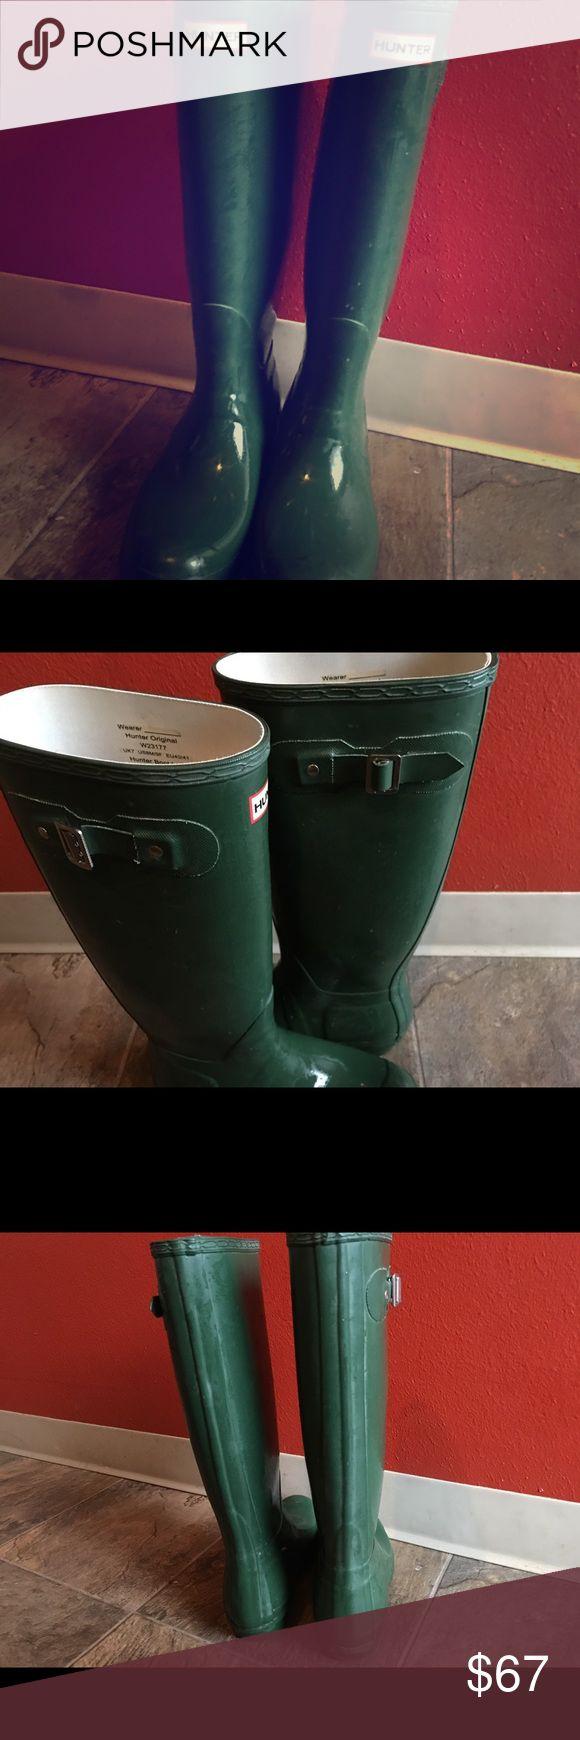 Gameboy color deer hunter gameshark codes - Hunter Rain Boots Sz 9 Hunter Green Great Condition Hunter Original Tall Rain Boots Sz